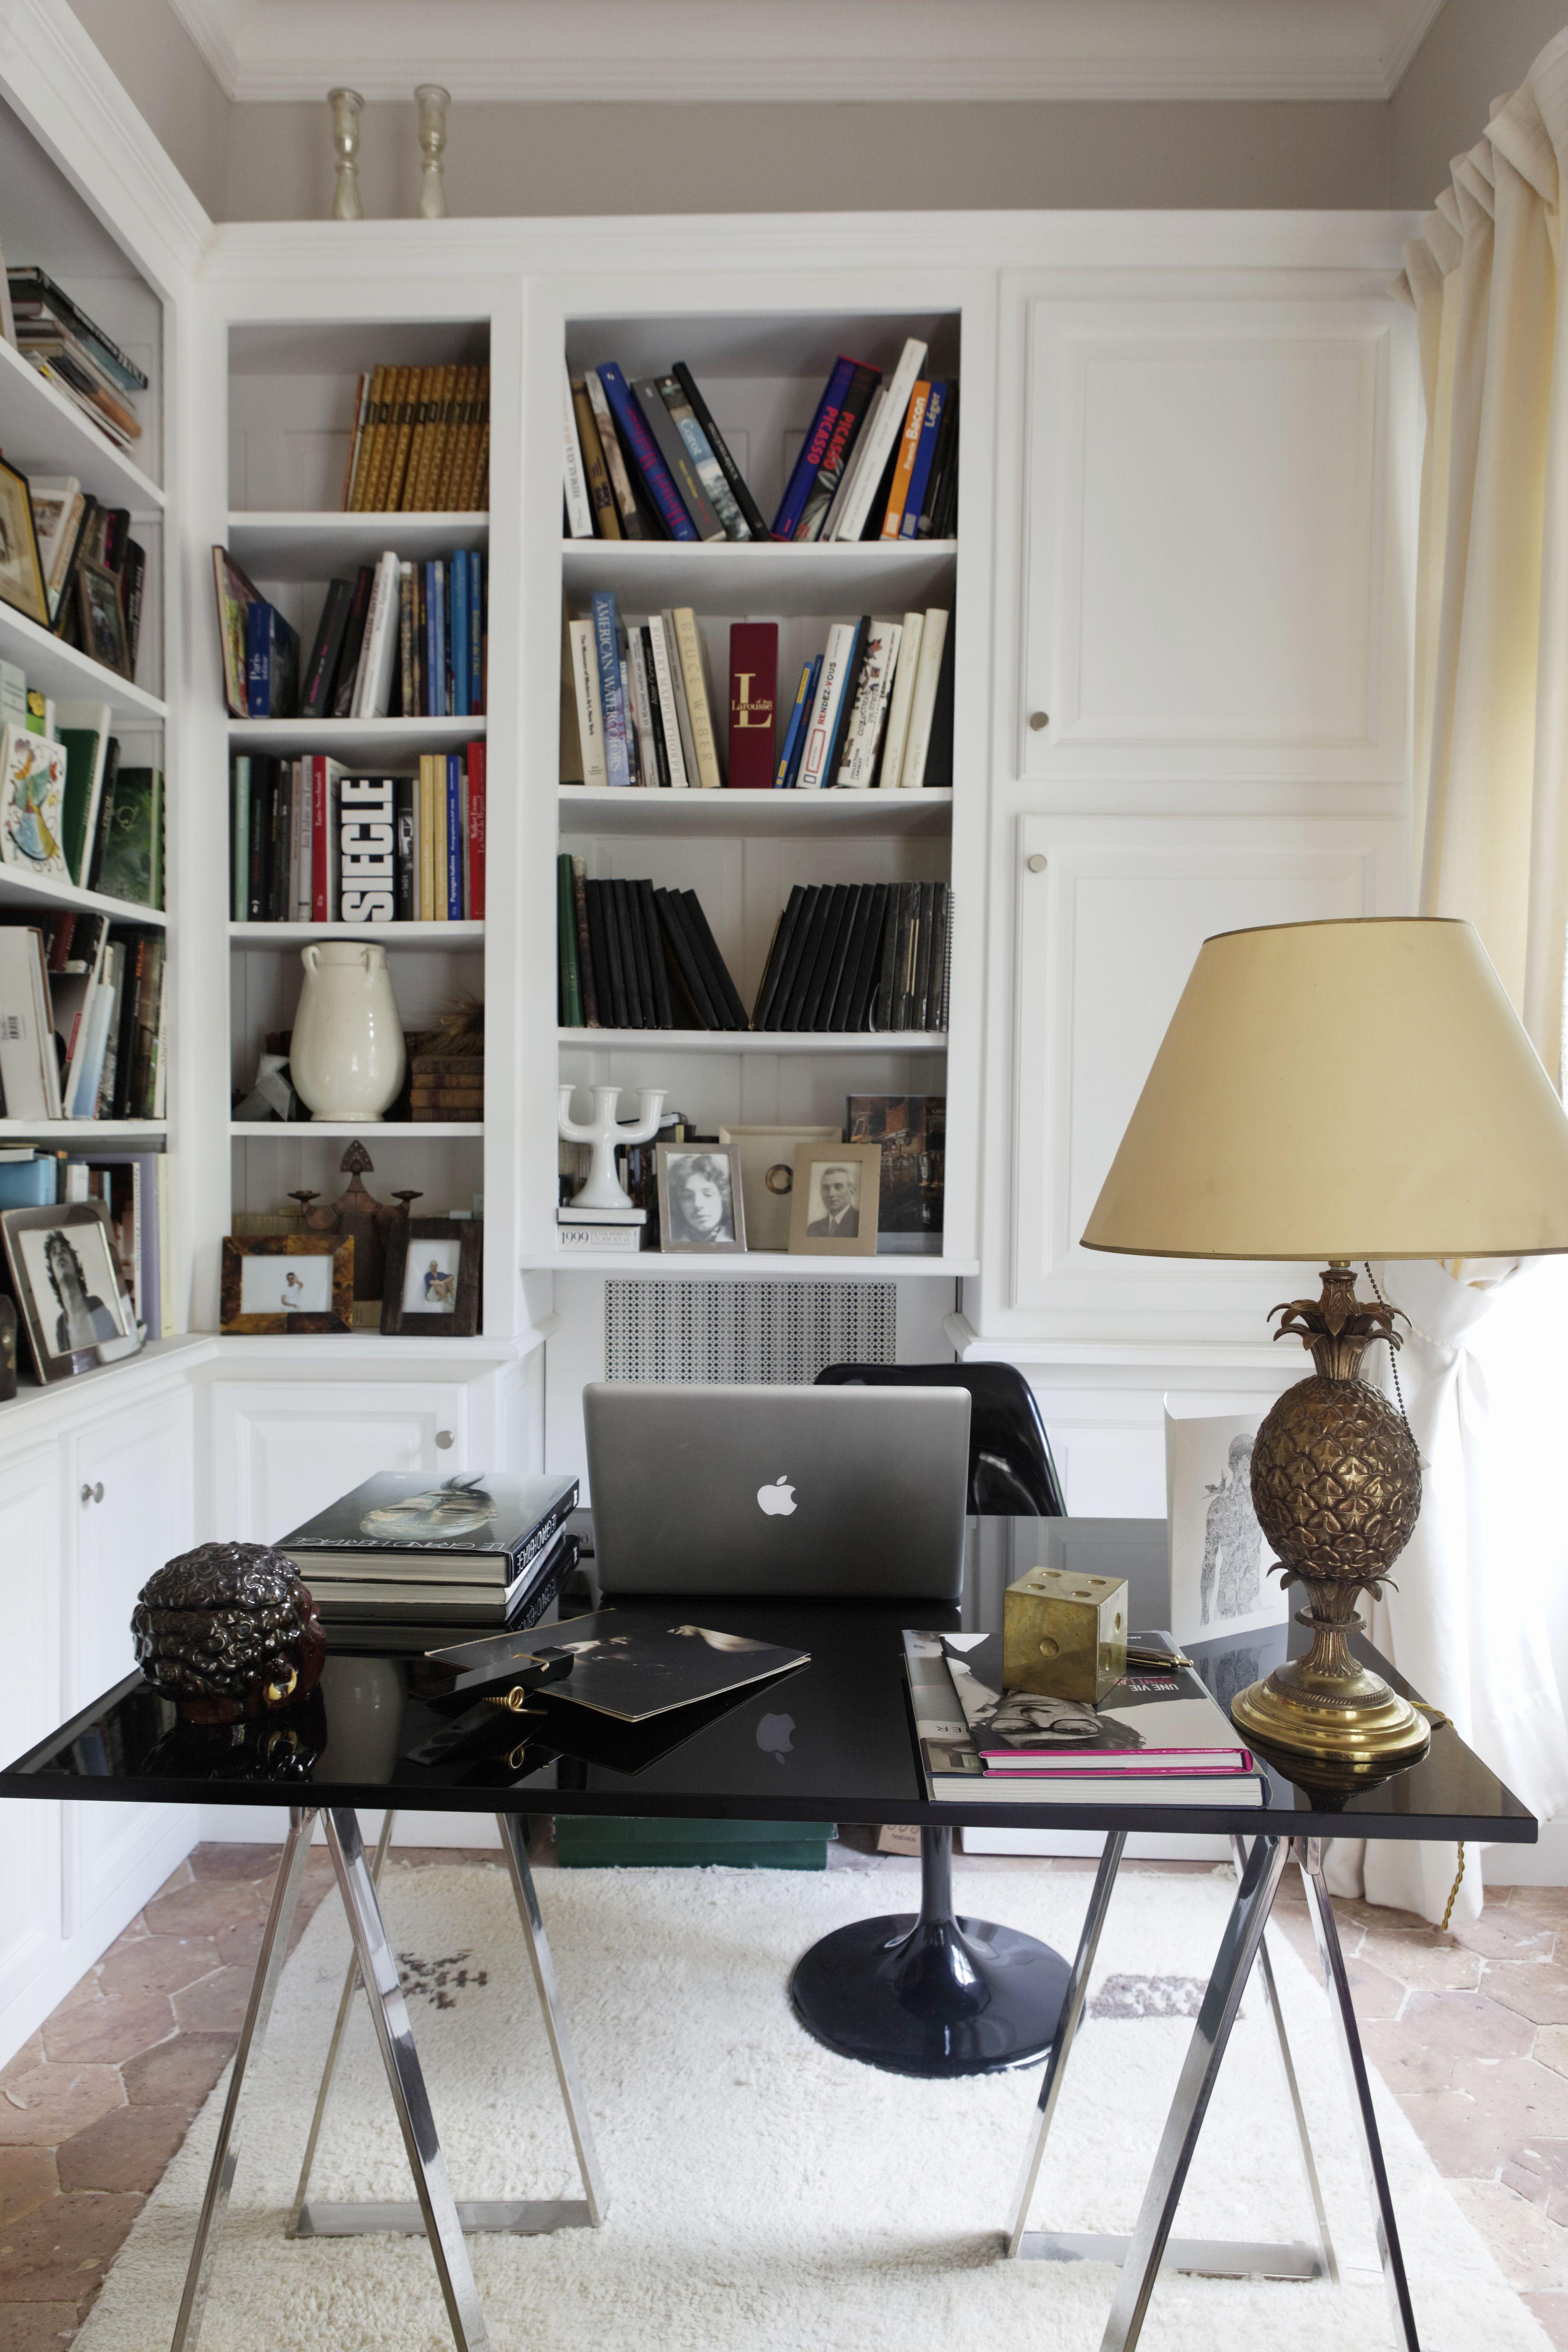 Arbeitszimmer Einrichten Arbeitszimmer Einrichten Einrichten Und Wohnen Wohnzimmer Arbeitszimmerideen